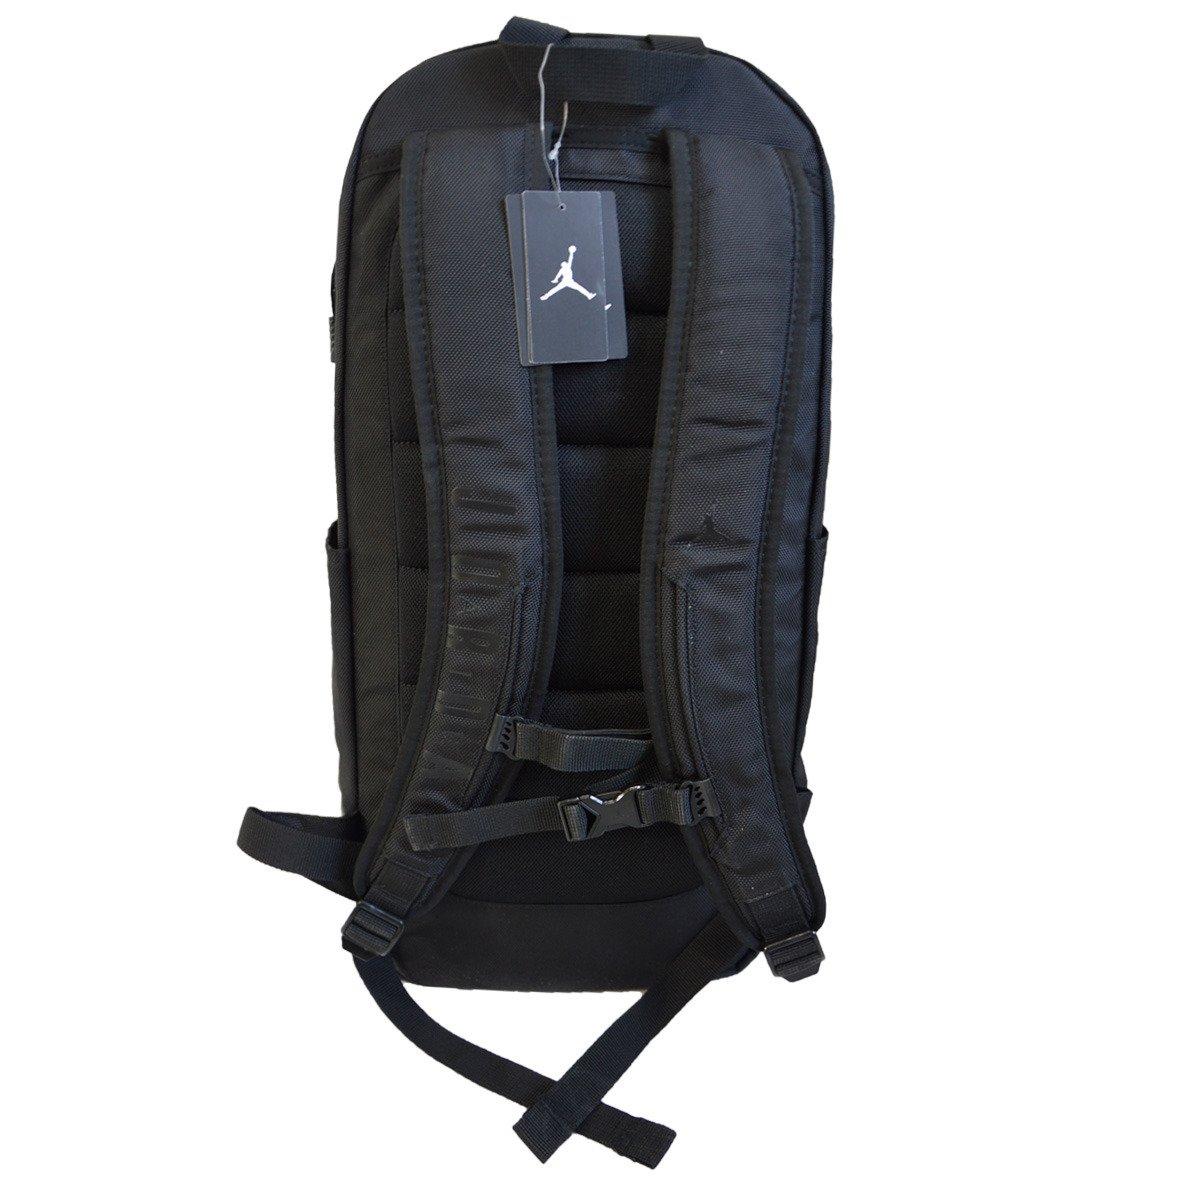 b6e552d514b Jordan Sport Backpack | Fitzpatrick Painting